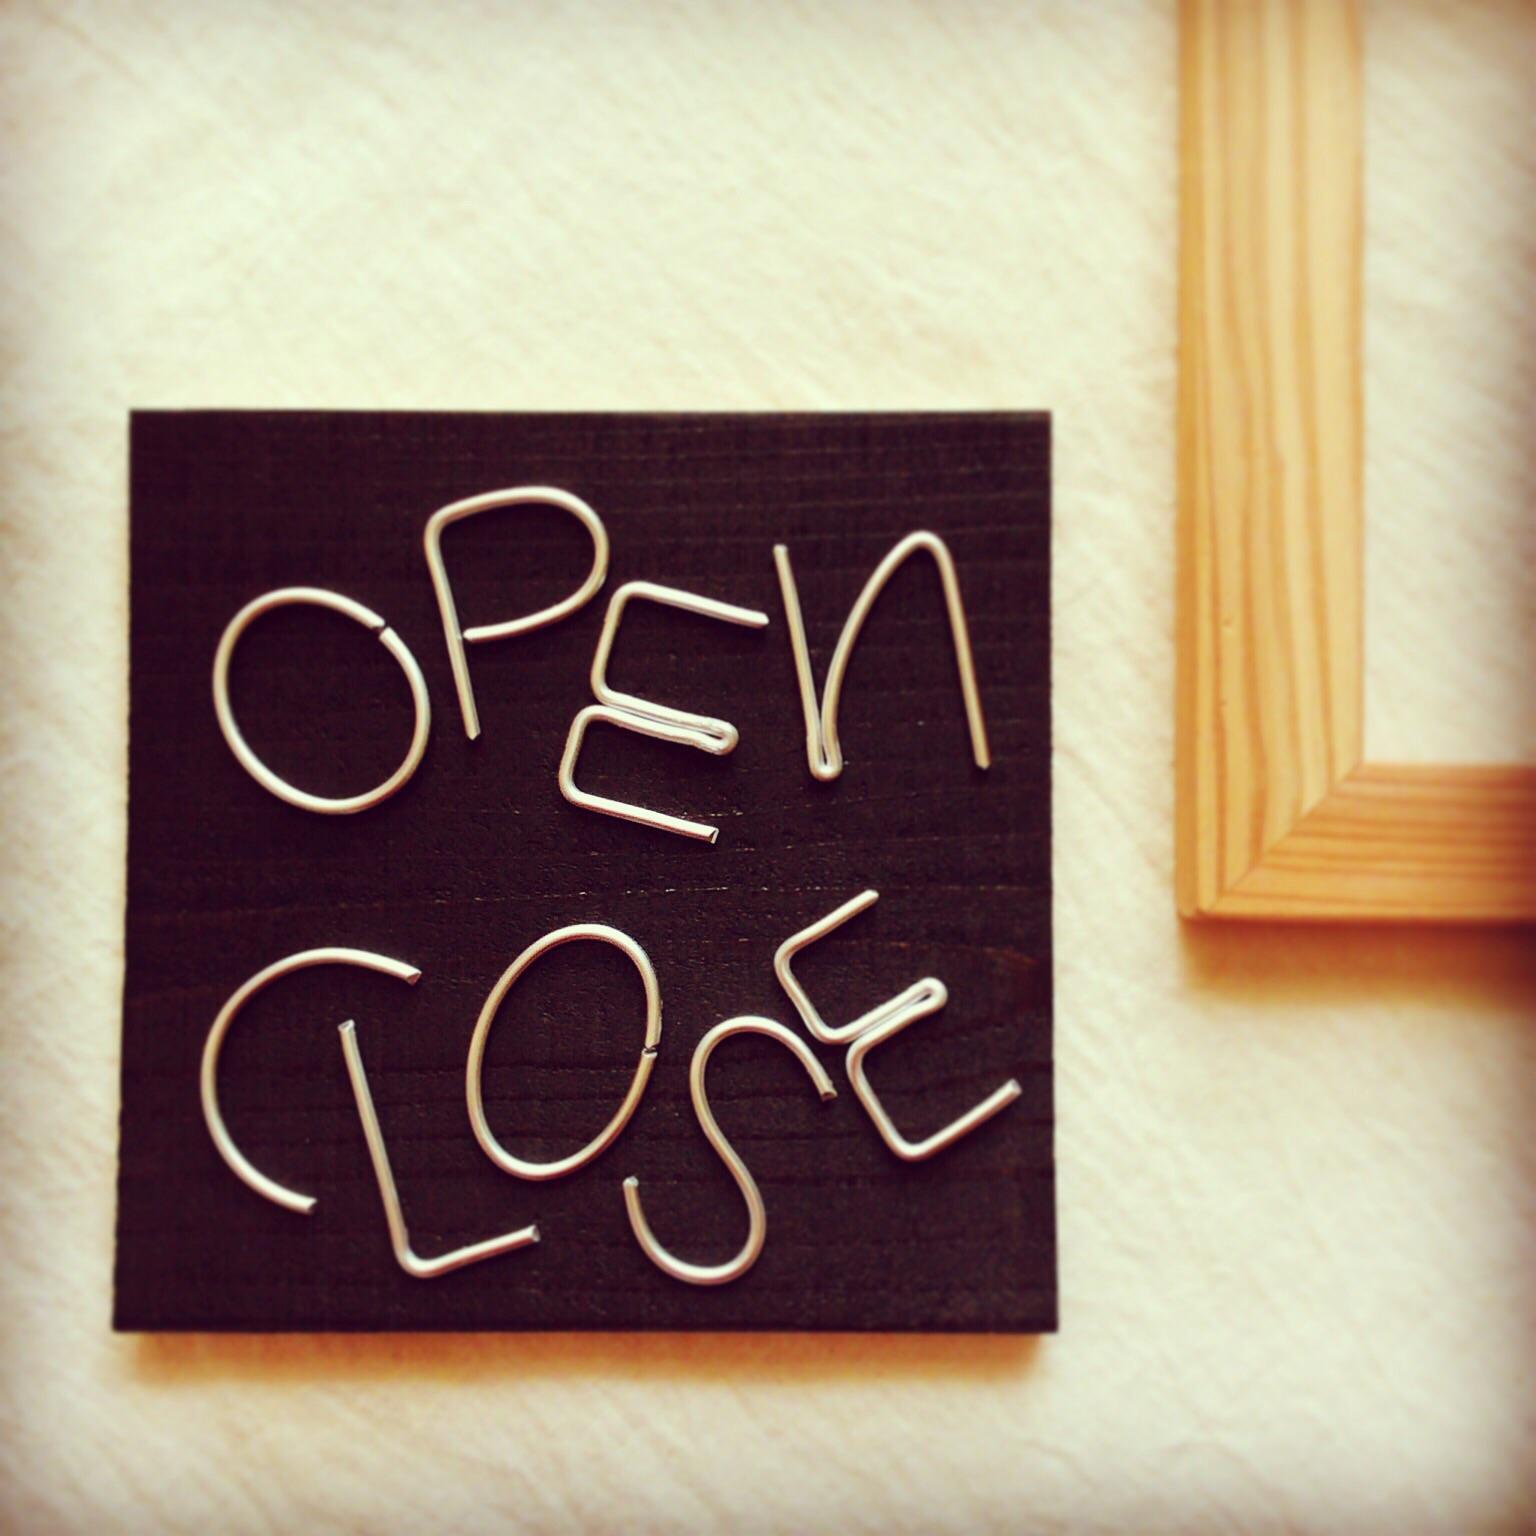 open/close看板&名刺スタンド。_b0125443_9383216.jpg